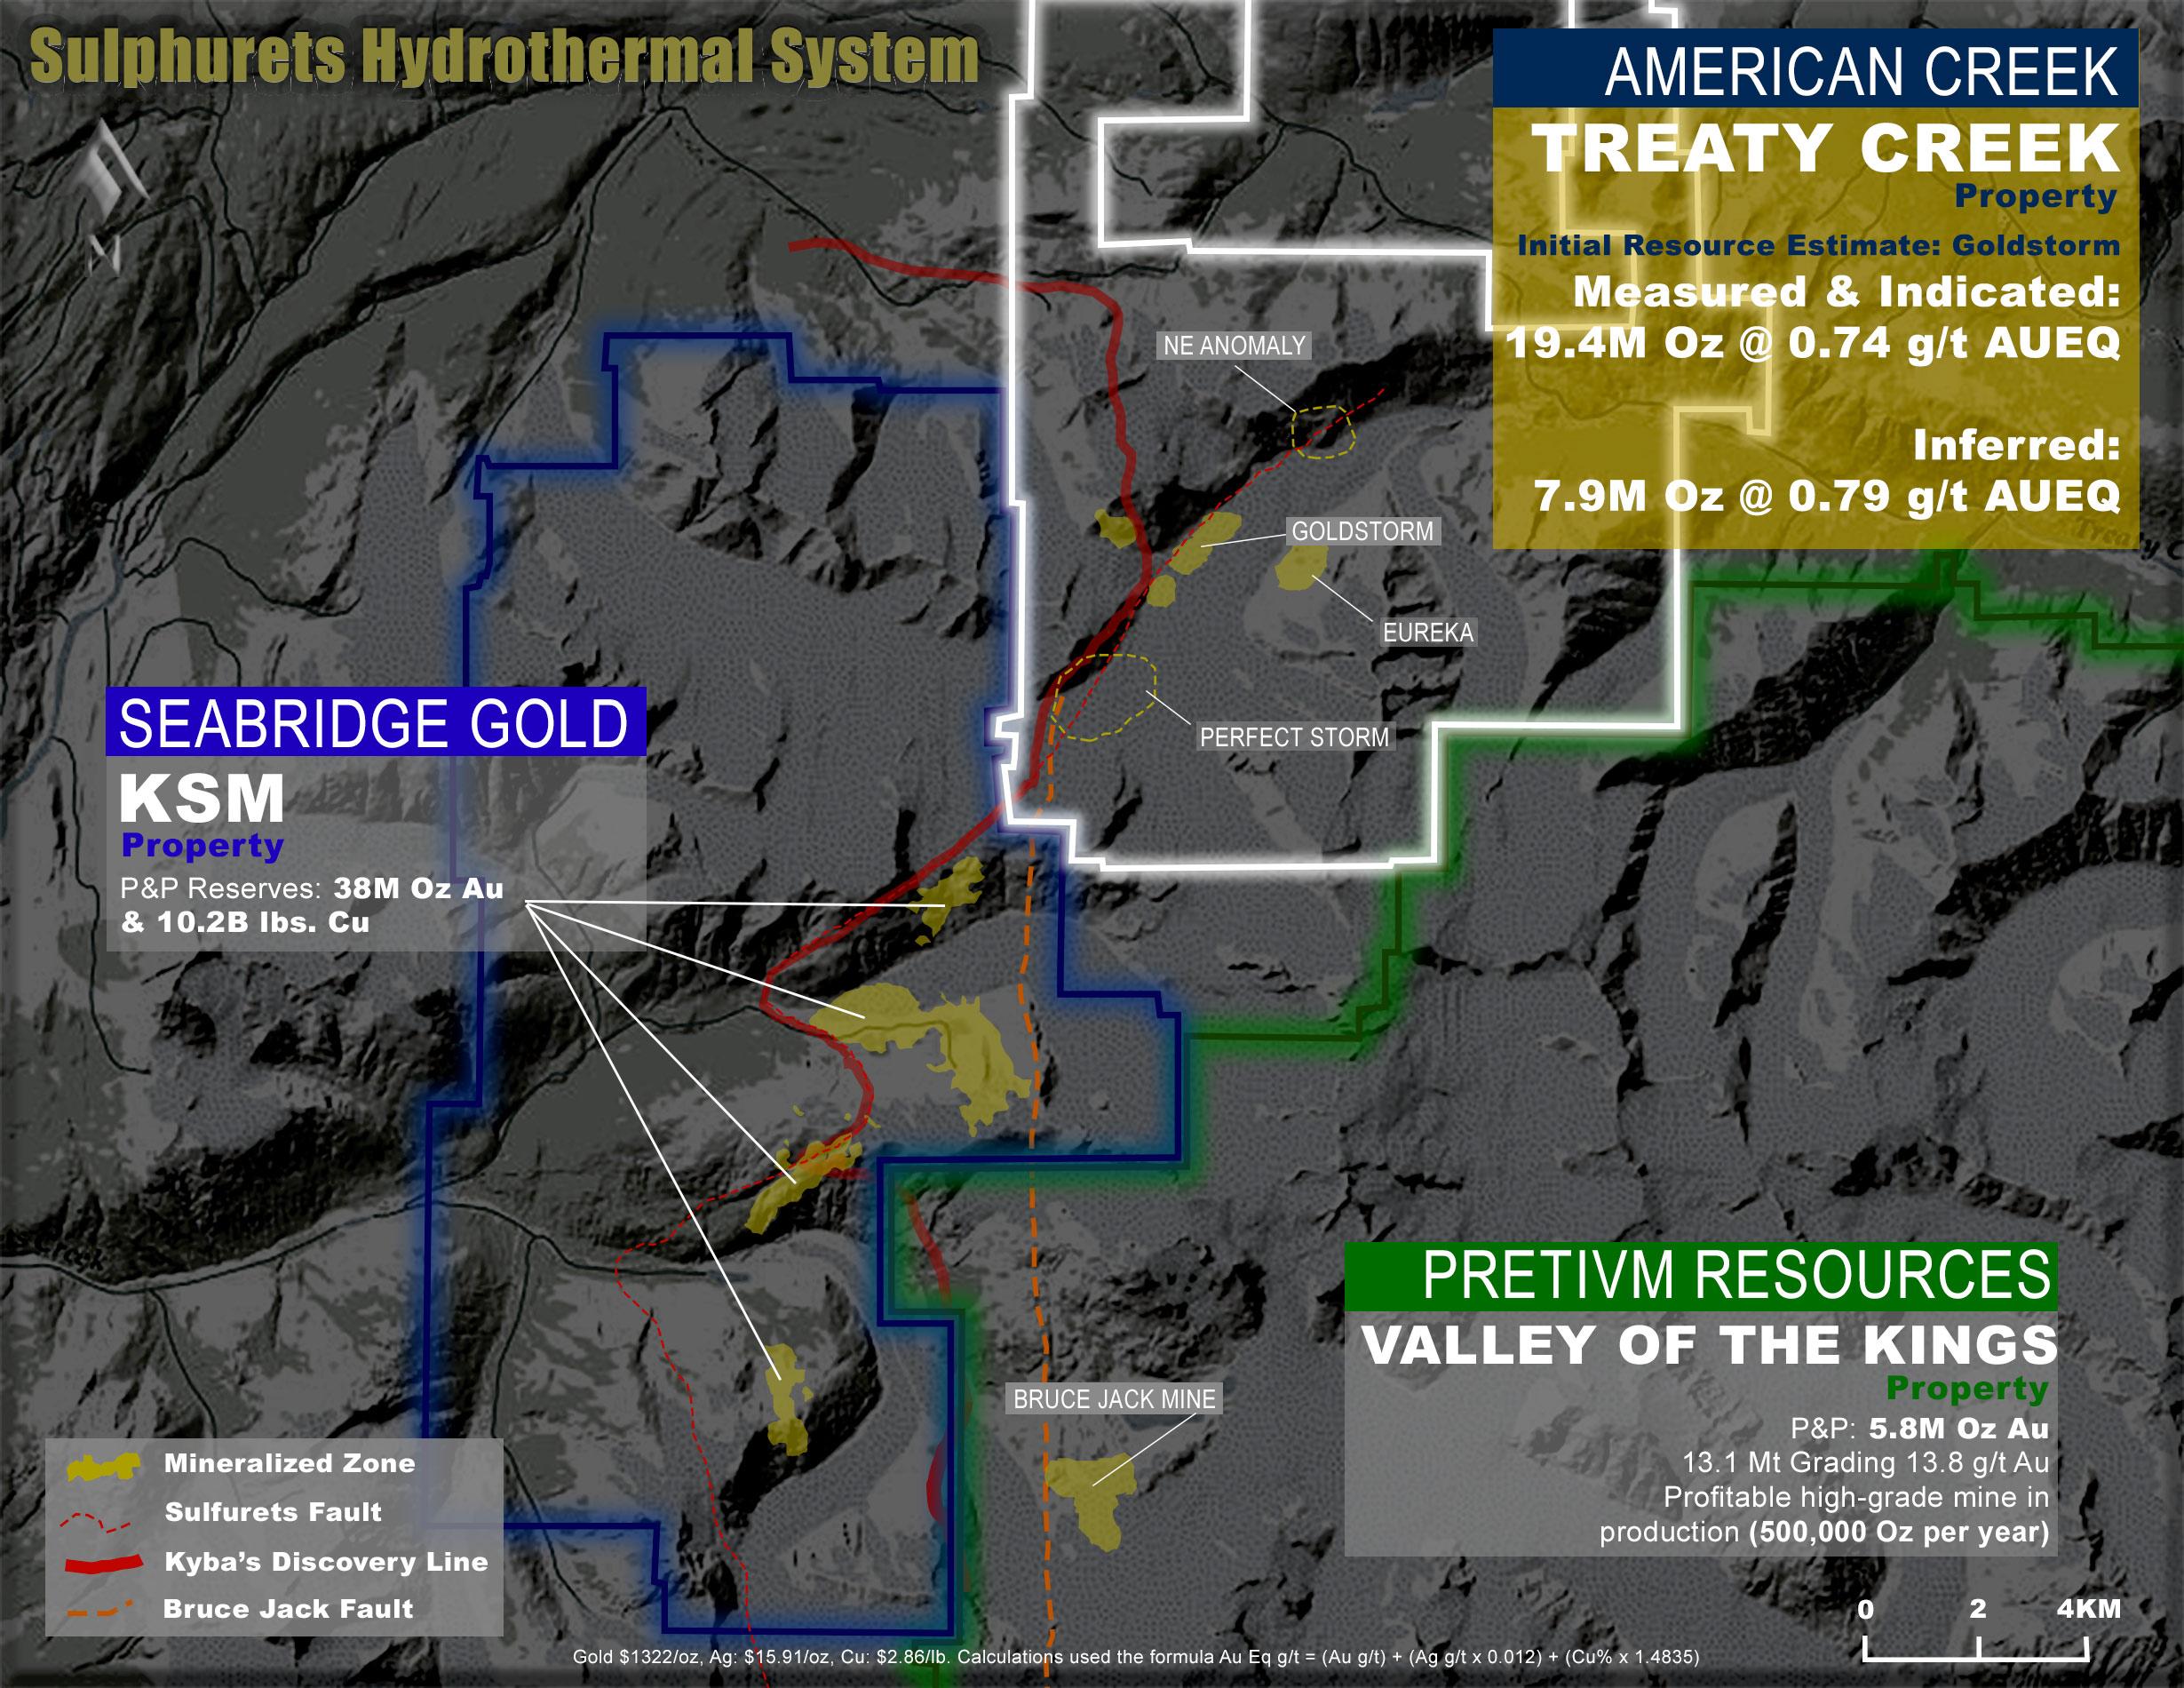 American Creek Treaty Creek map